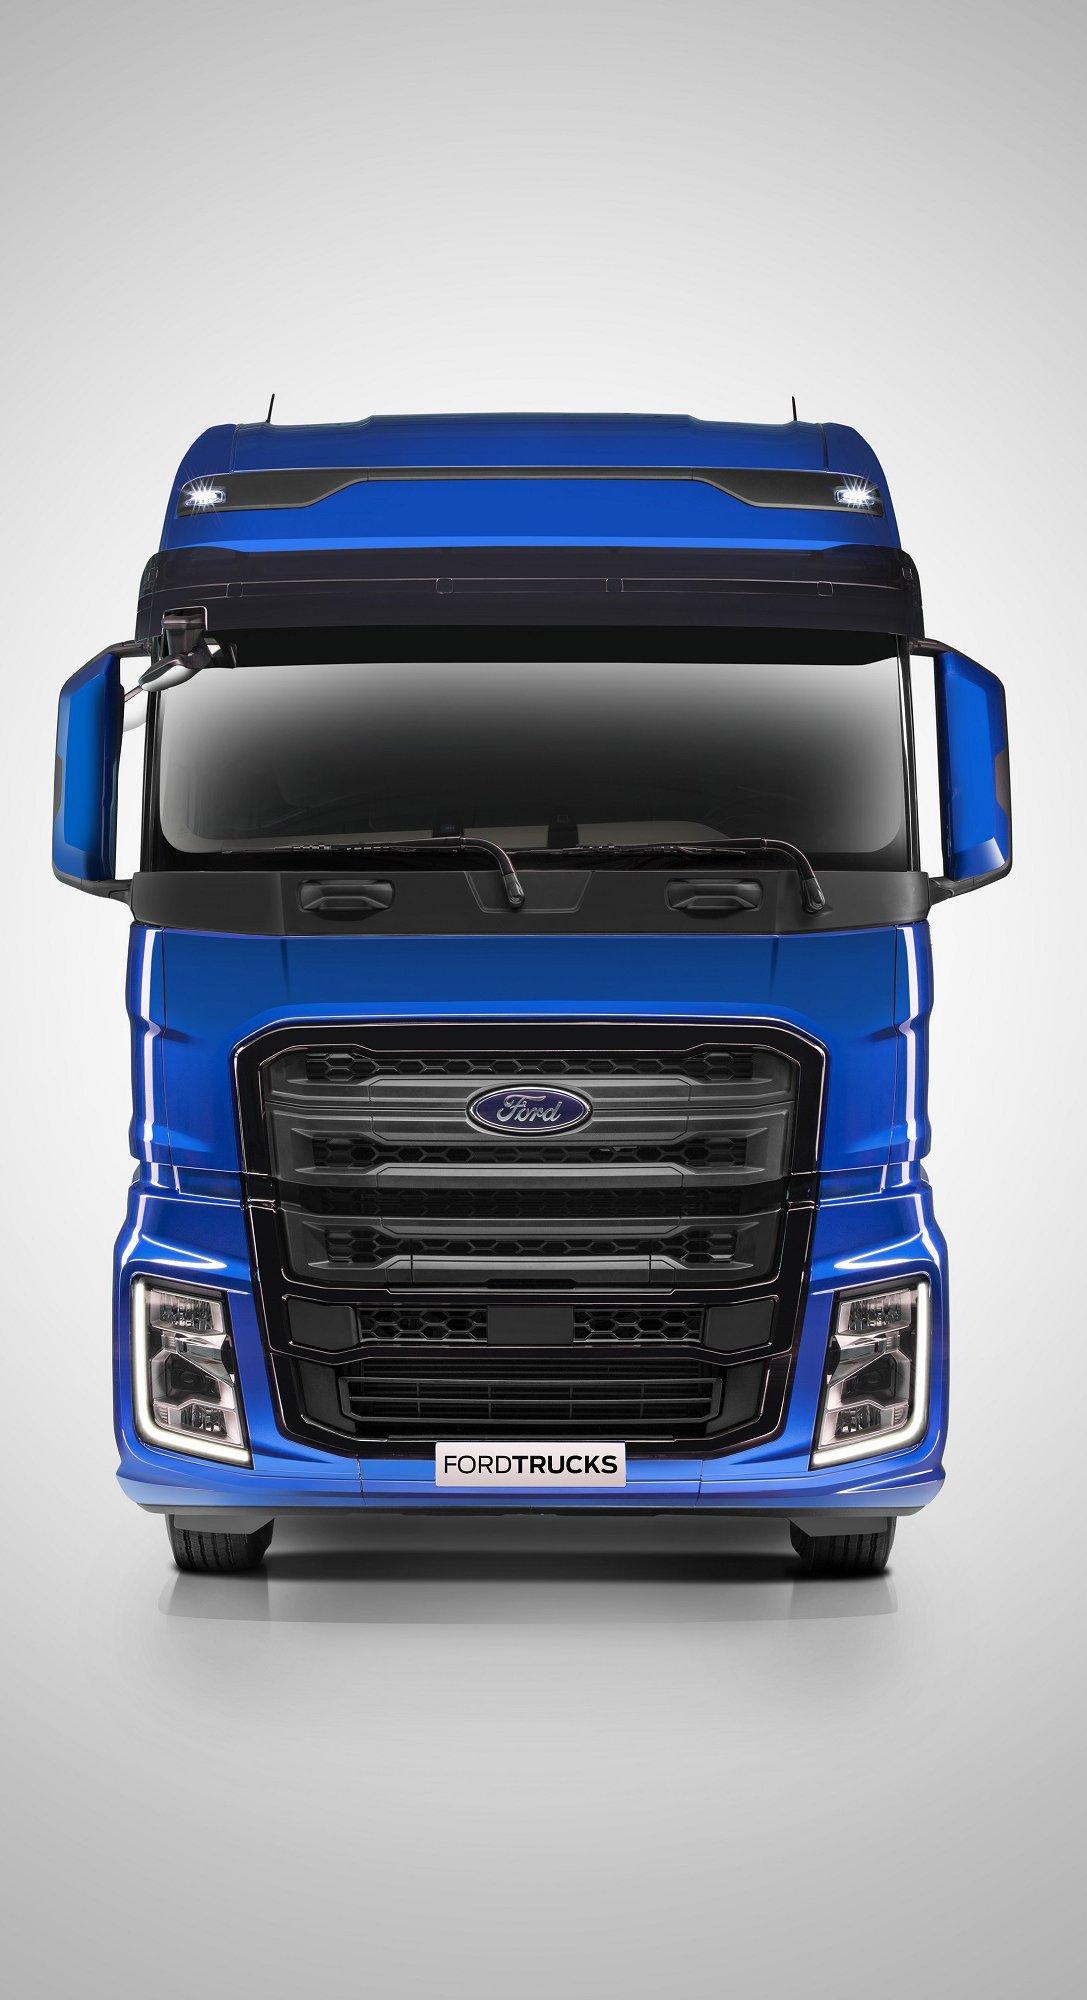 ford-trucks-yeni-cekici-2-kopya